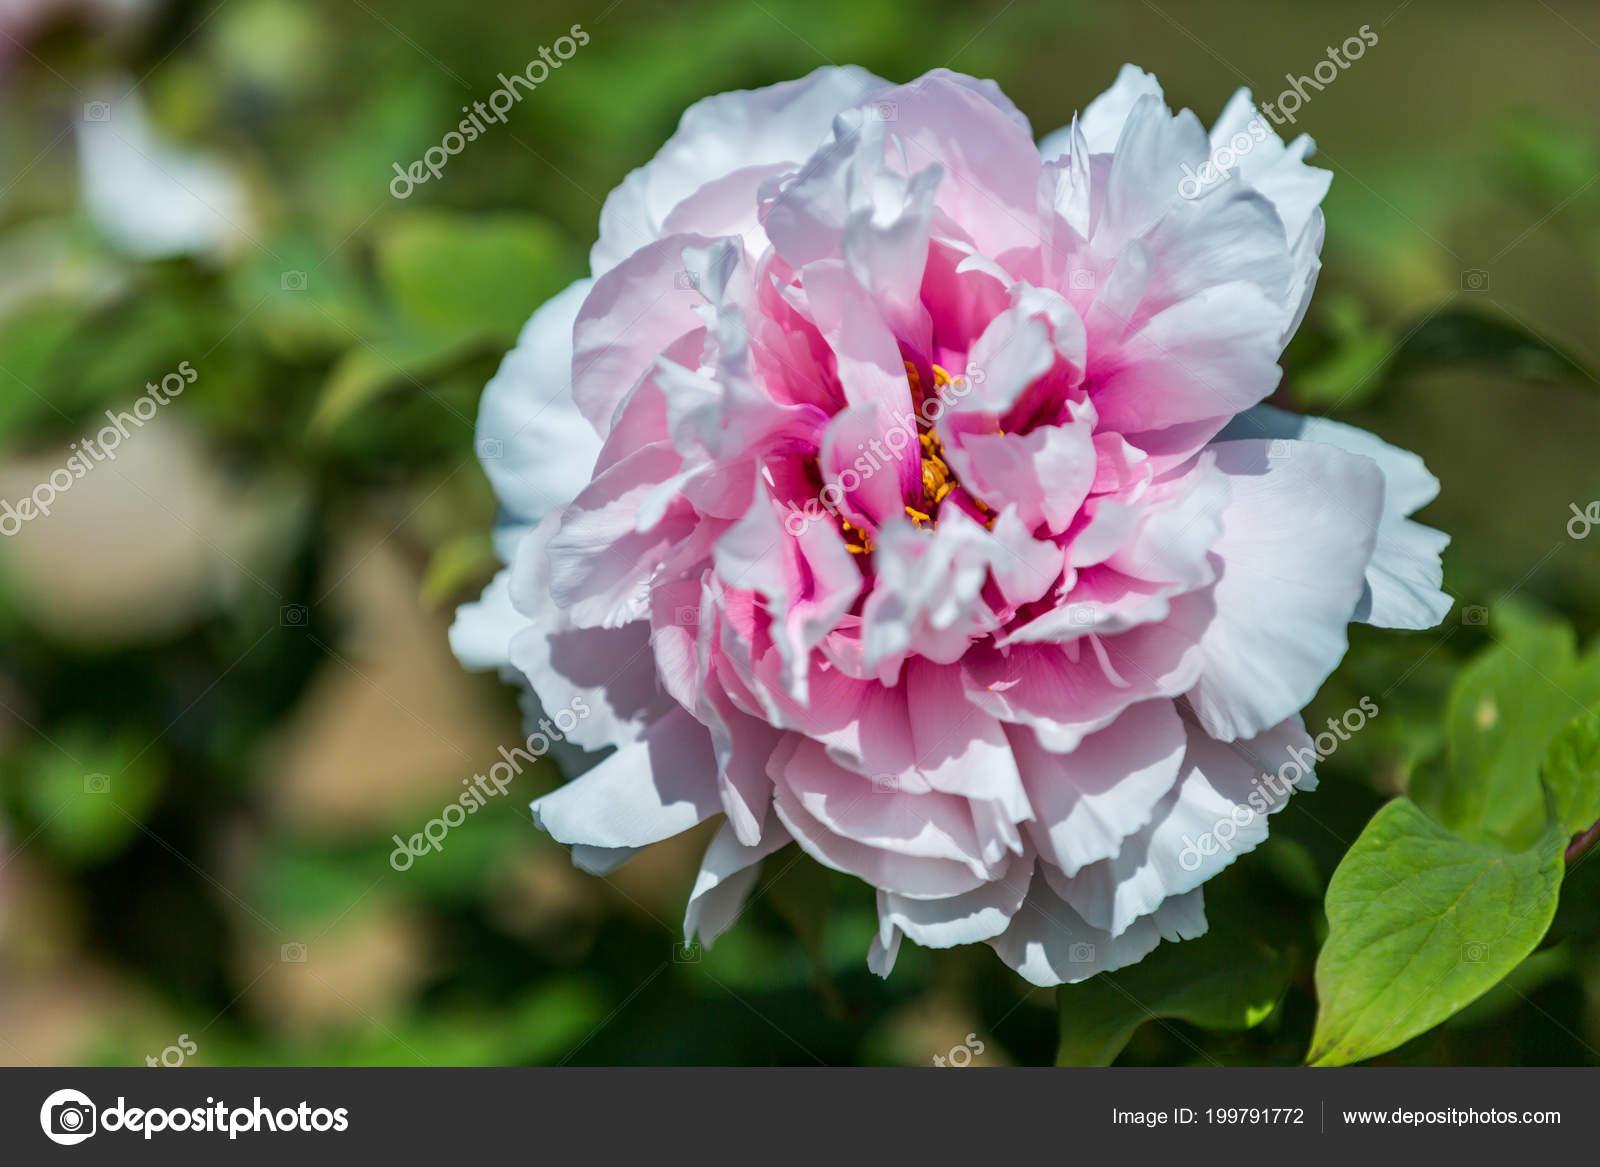 Beautiful flowers peonies bouquet pink peony background stock beautiful flowers peonies bouquet pink peony background stock photo izmirmasajfo